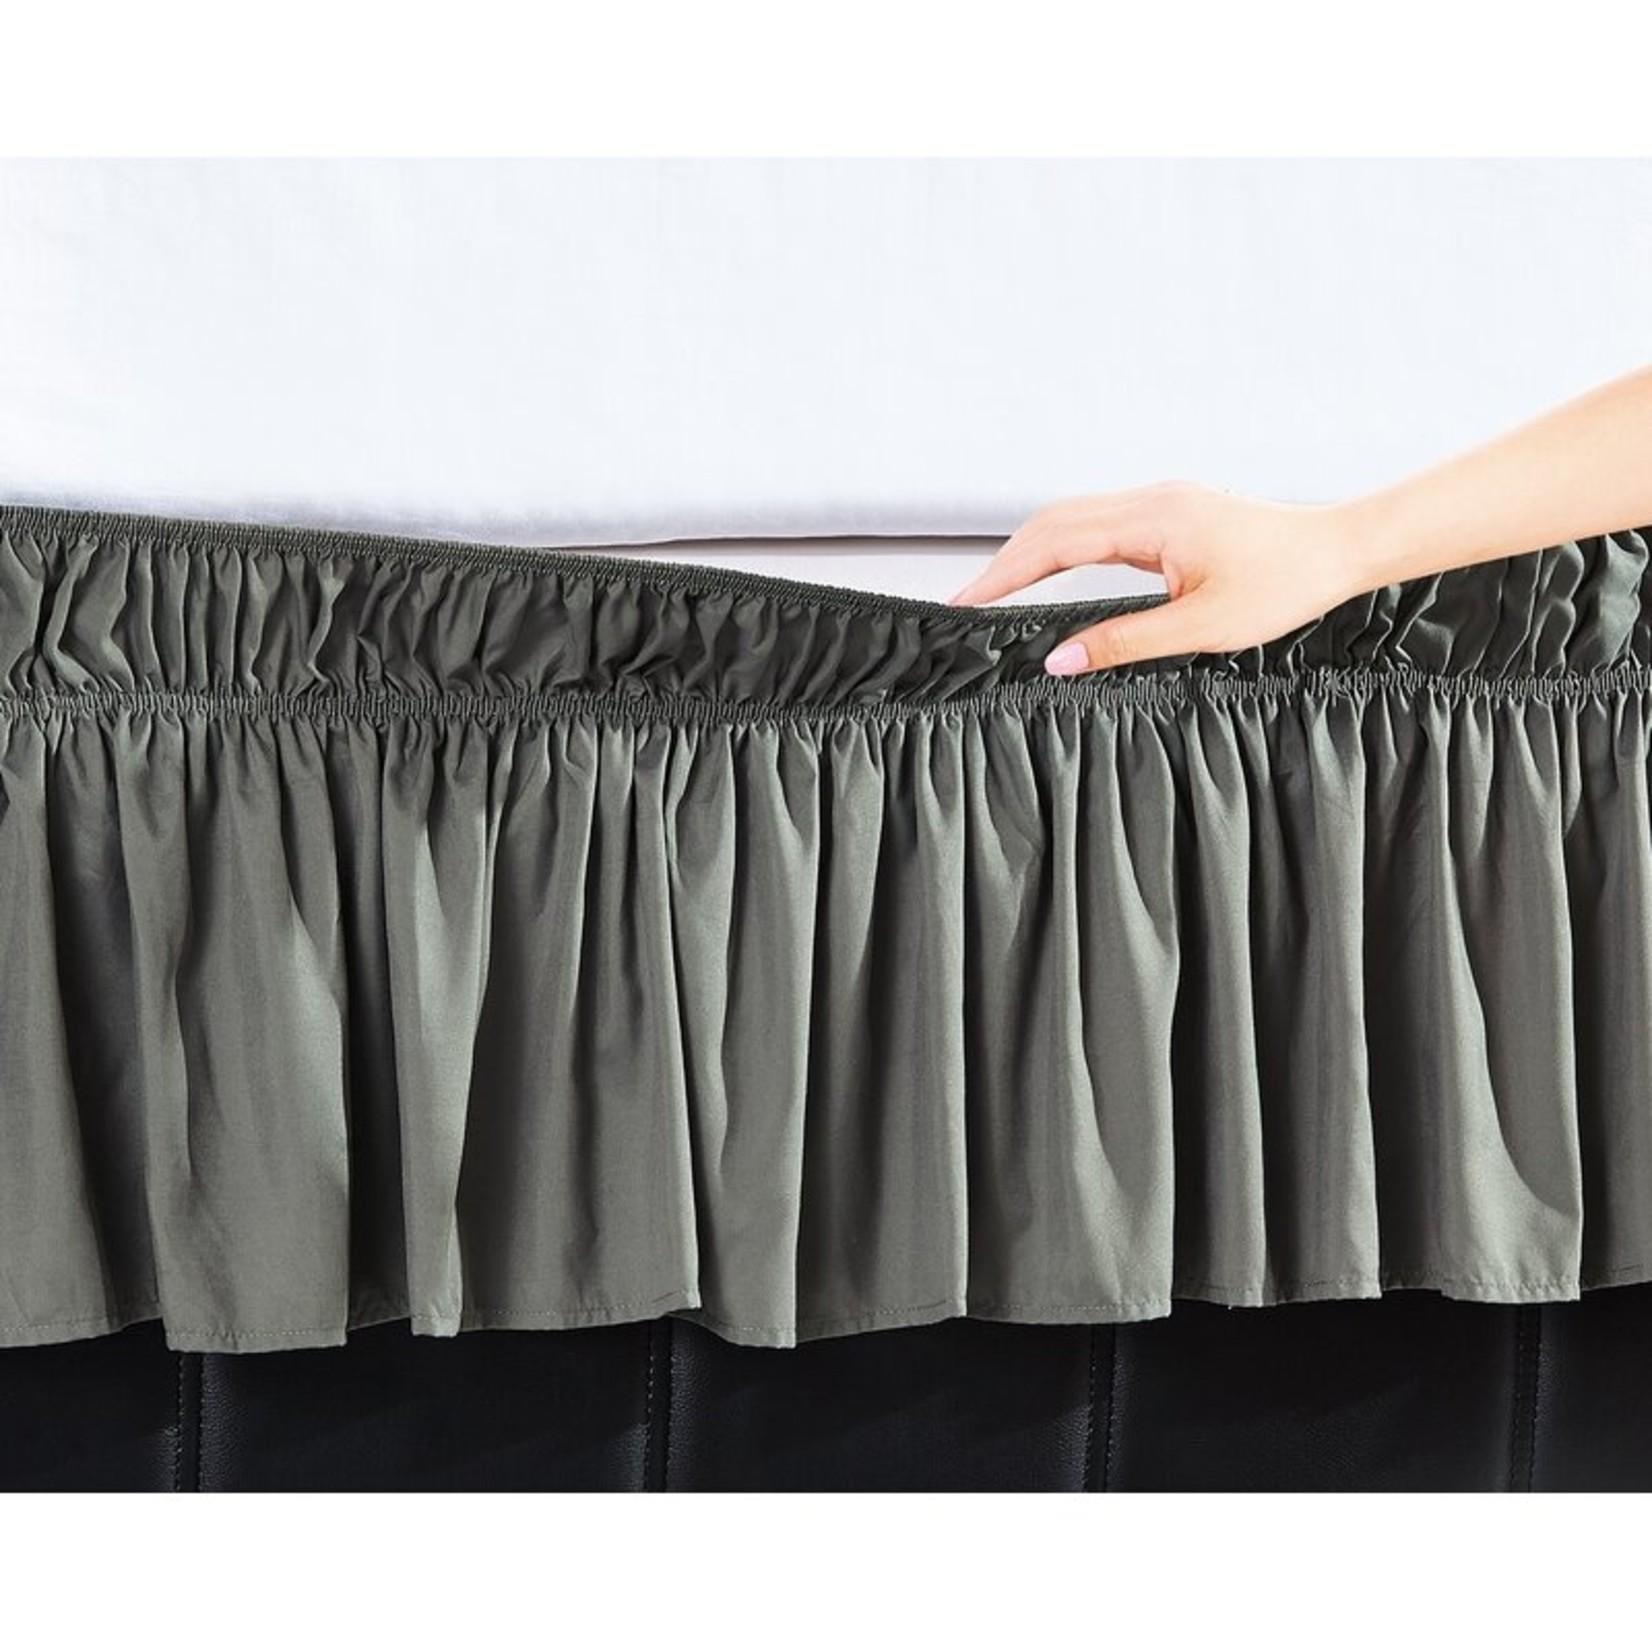 "*Queen/King - Easy Wrap Platform Free Dust Ruffle 16"" Bed Skirt - Gray - Final Sale"